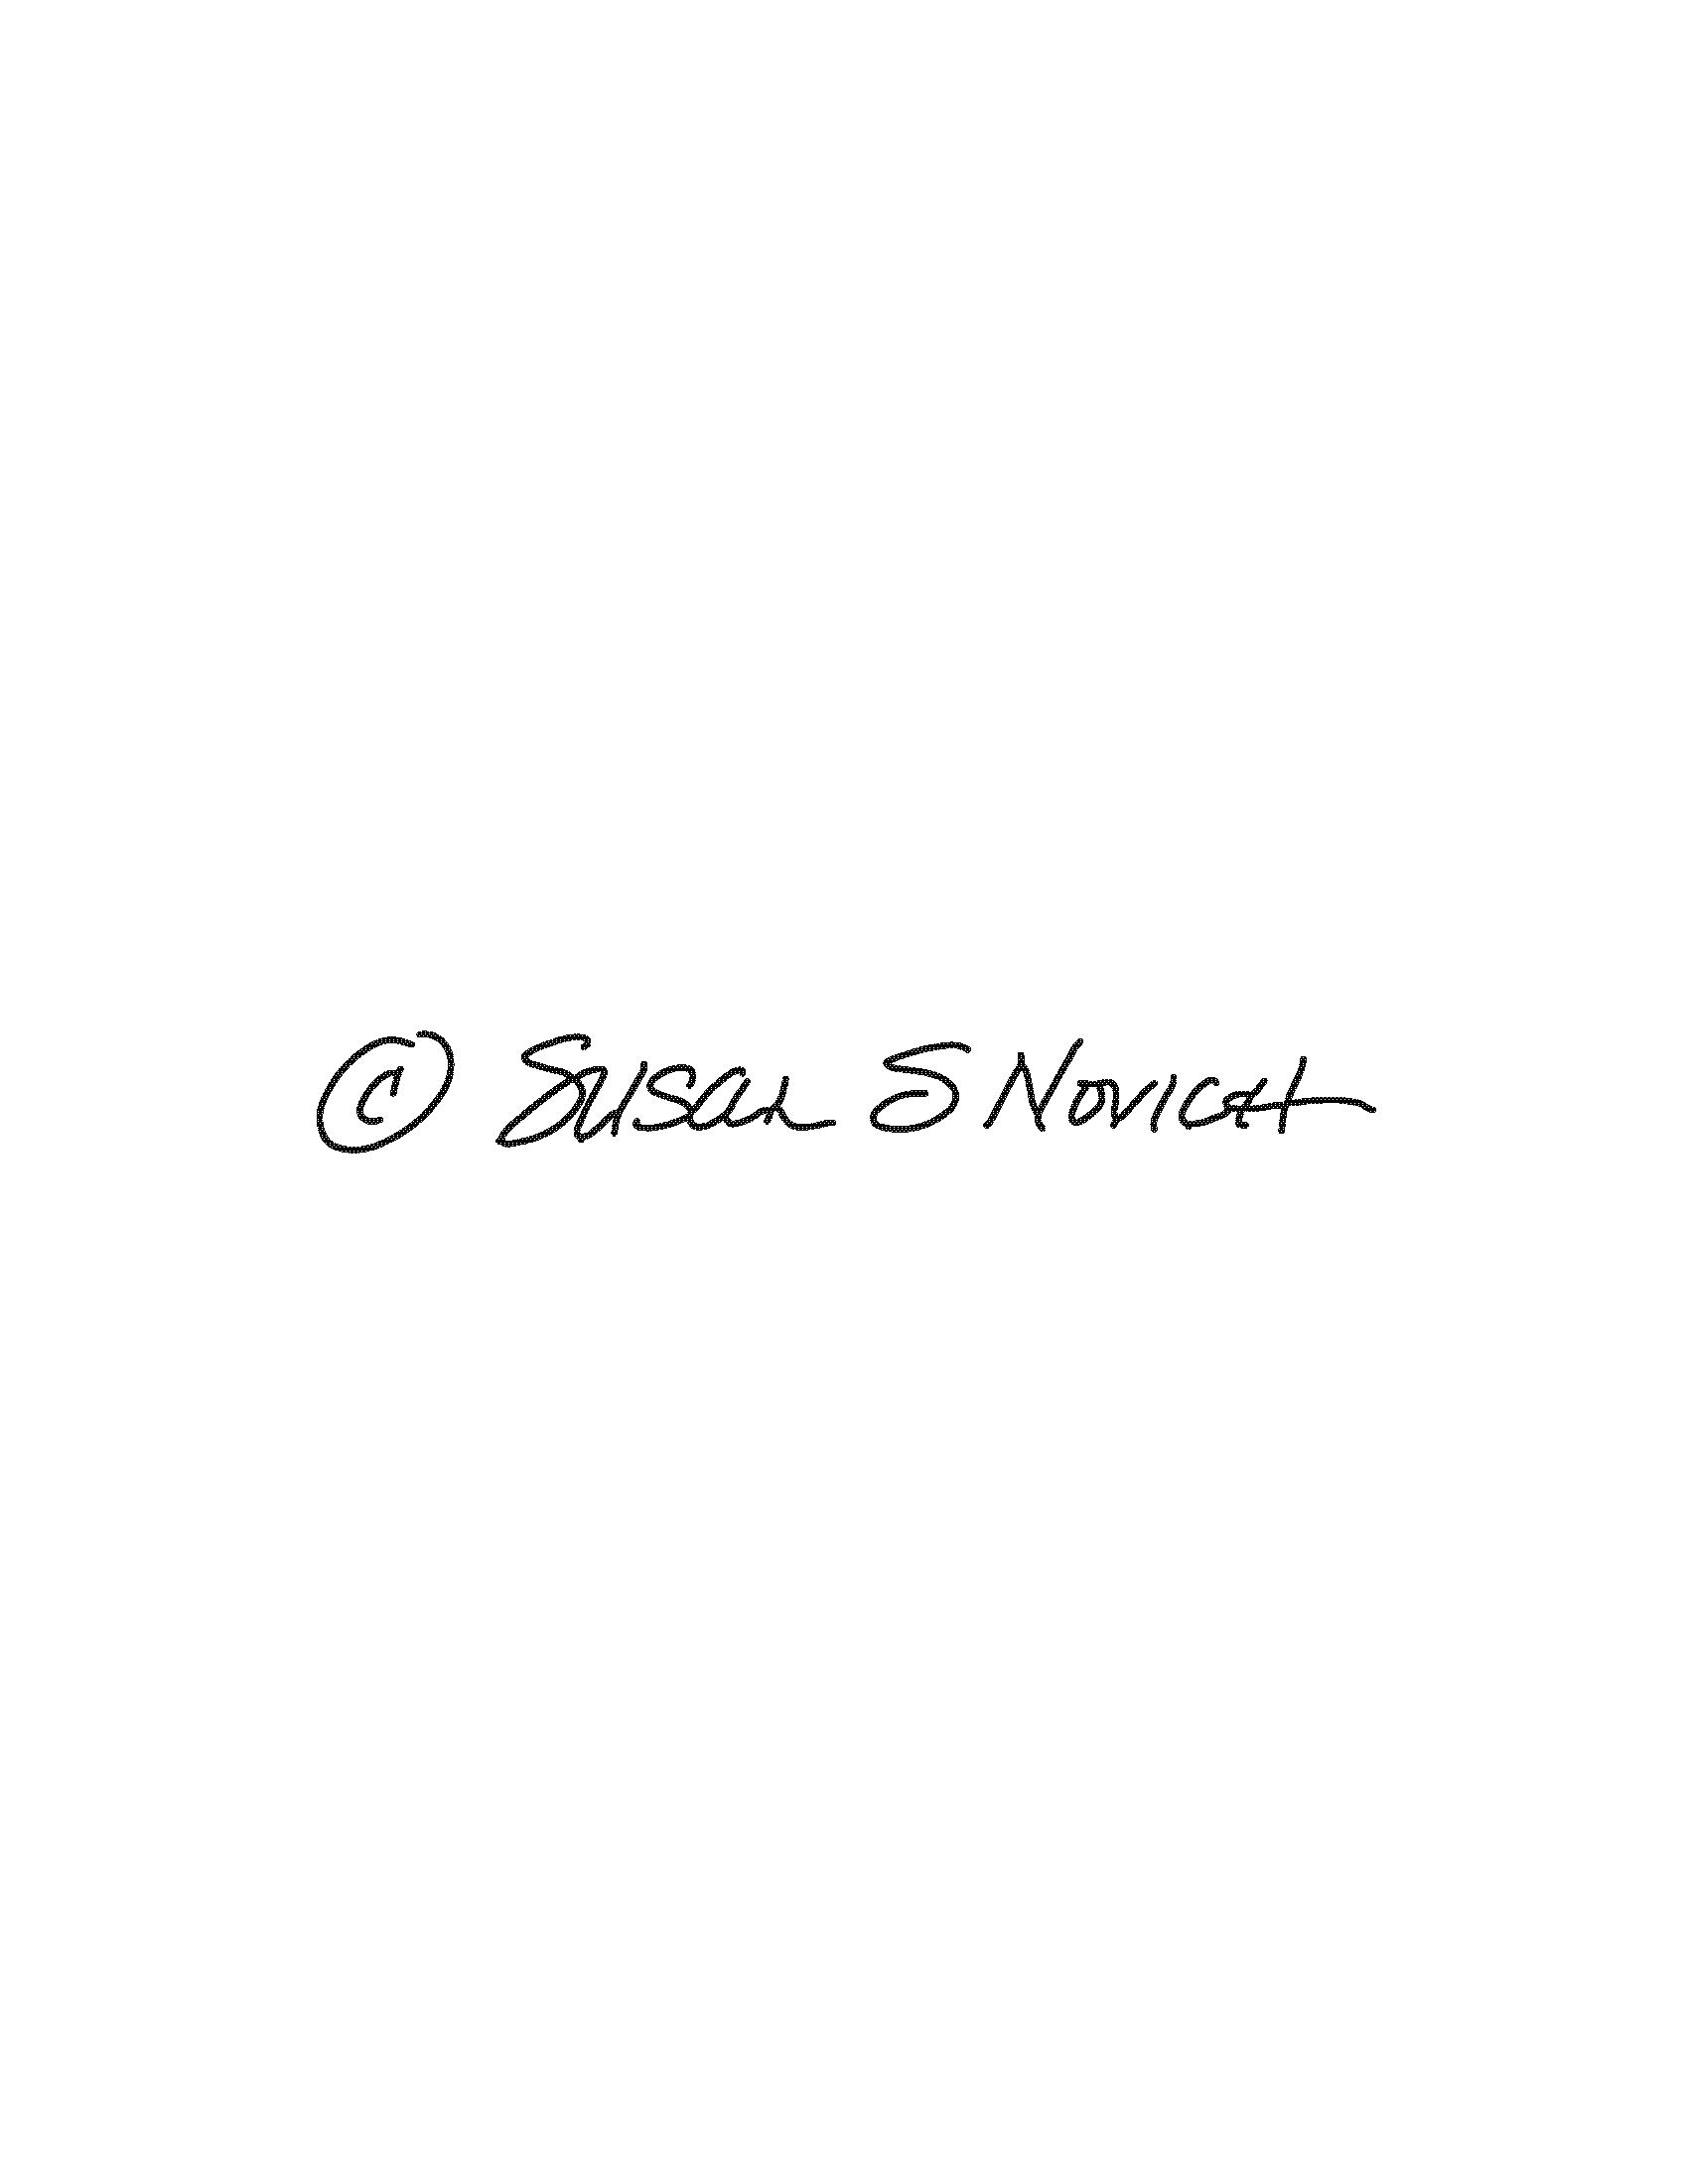 Susan Novich's Signature